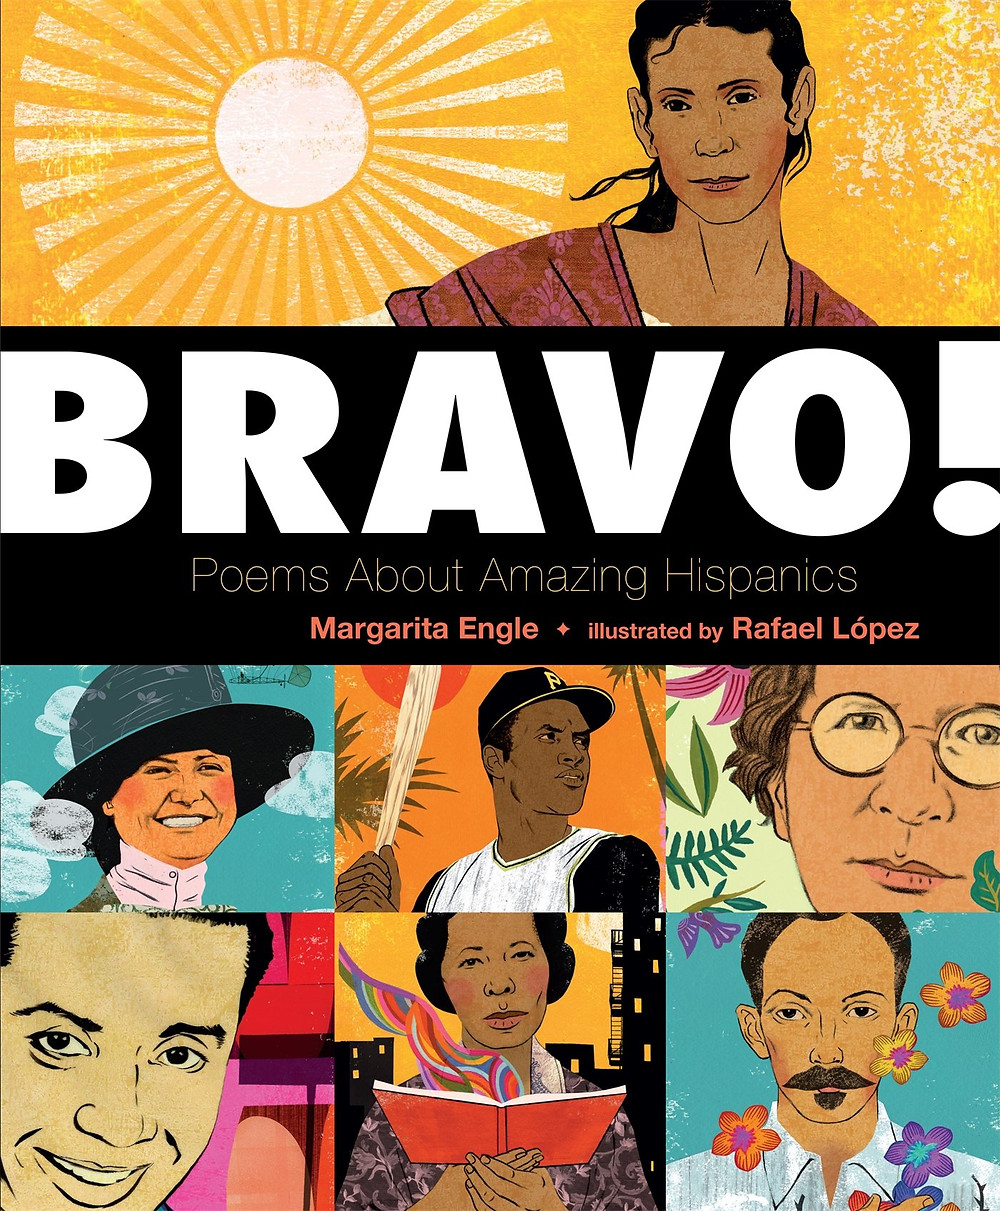 Bravo! Poems About Amazin Hispanics Children's Book